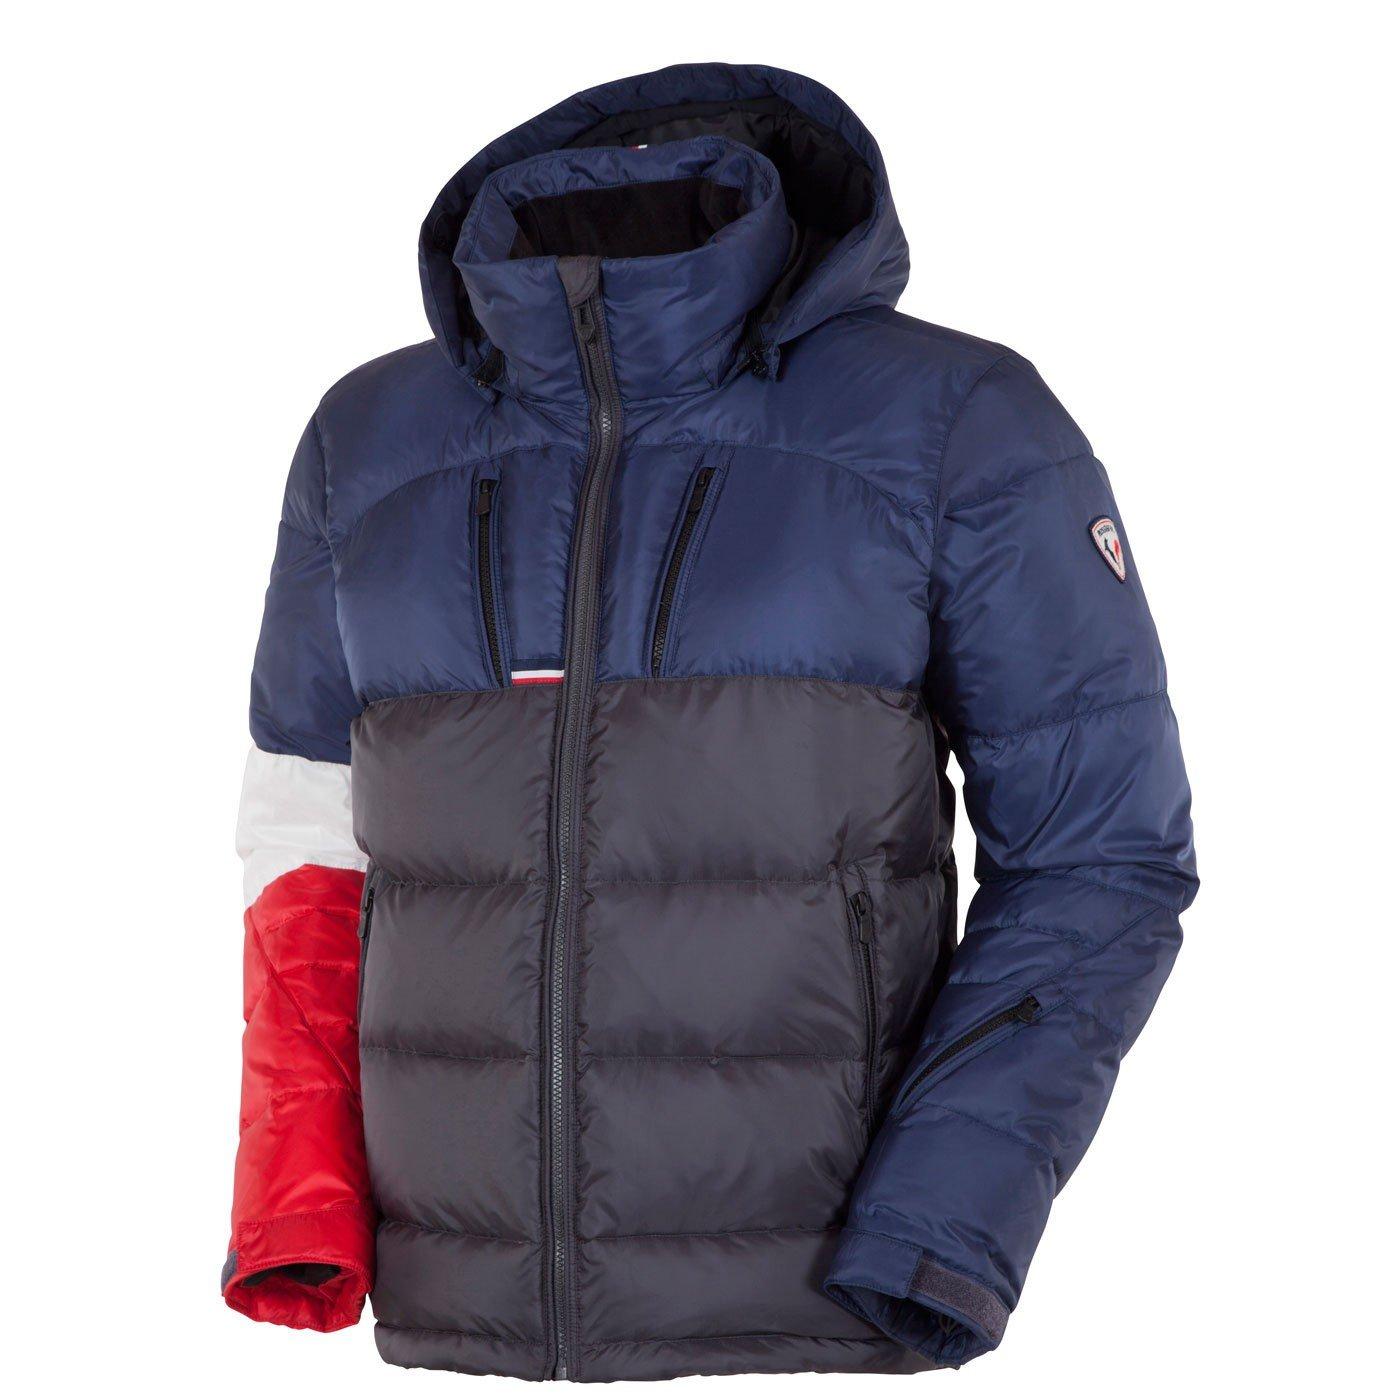 7826a4cf2 Rossignol M Vantage Down Jacket - Anthra - S - Mens warm down jacket ...